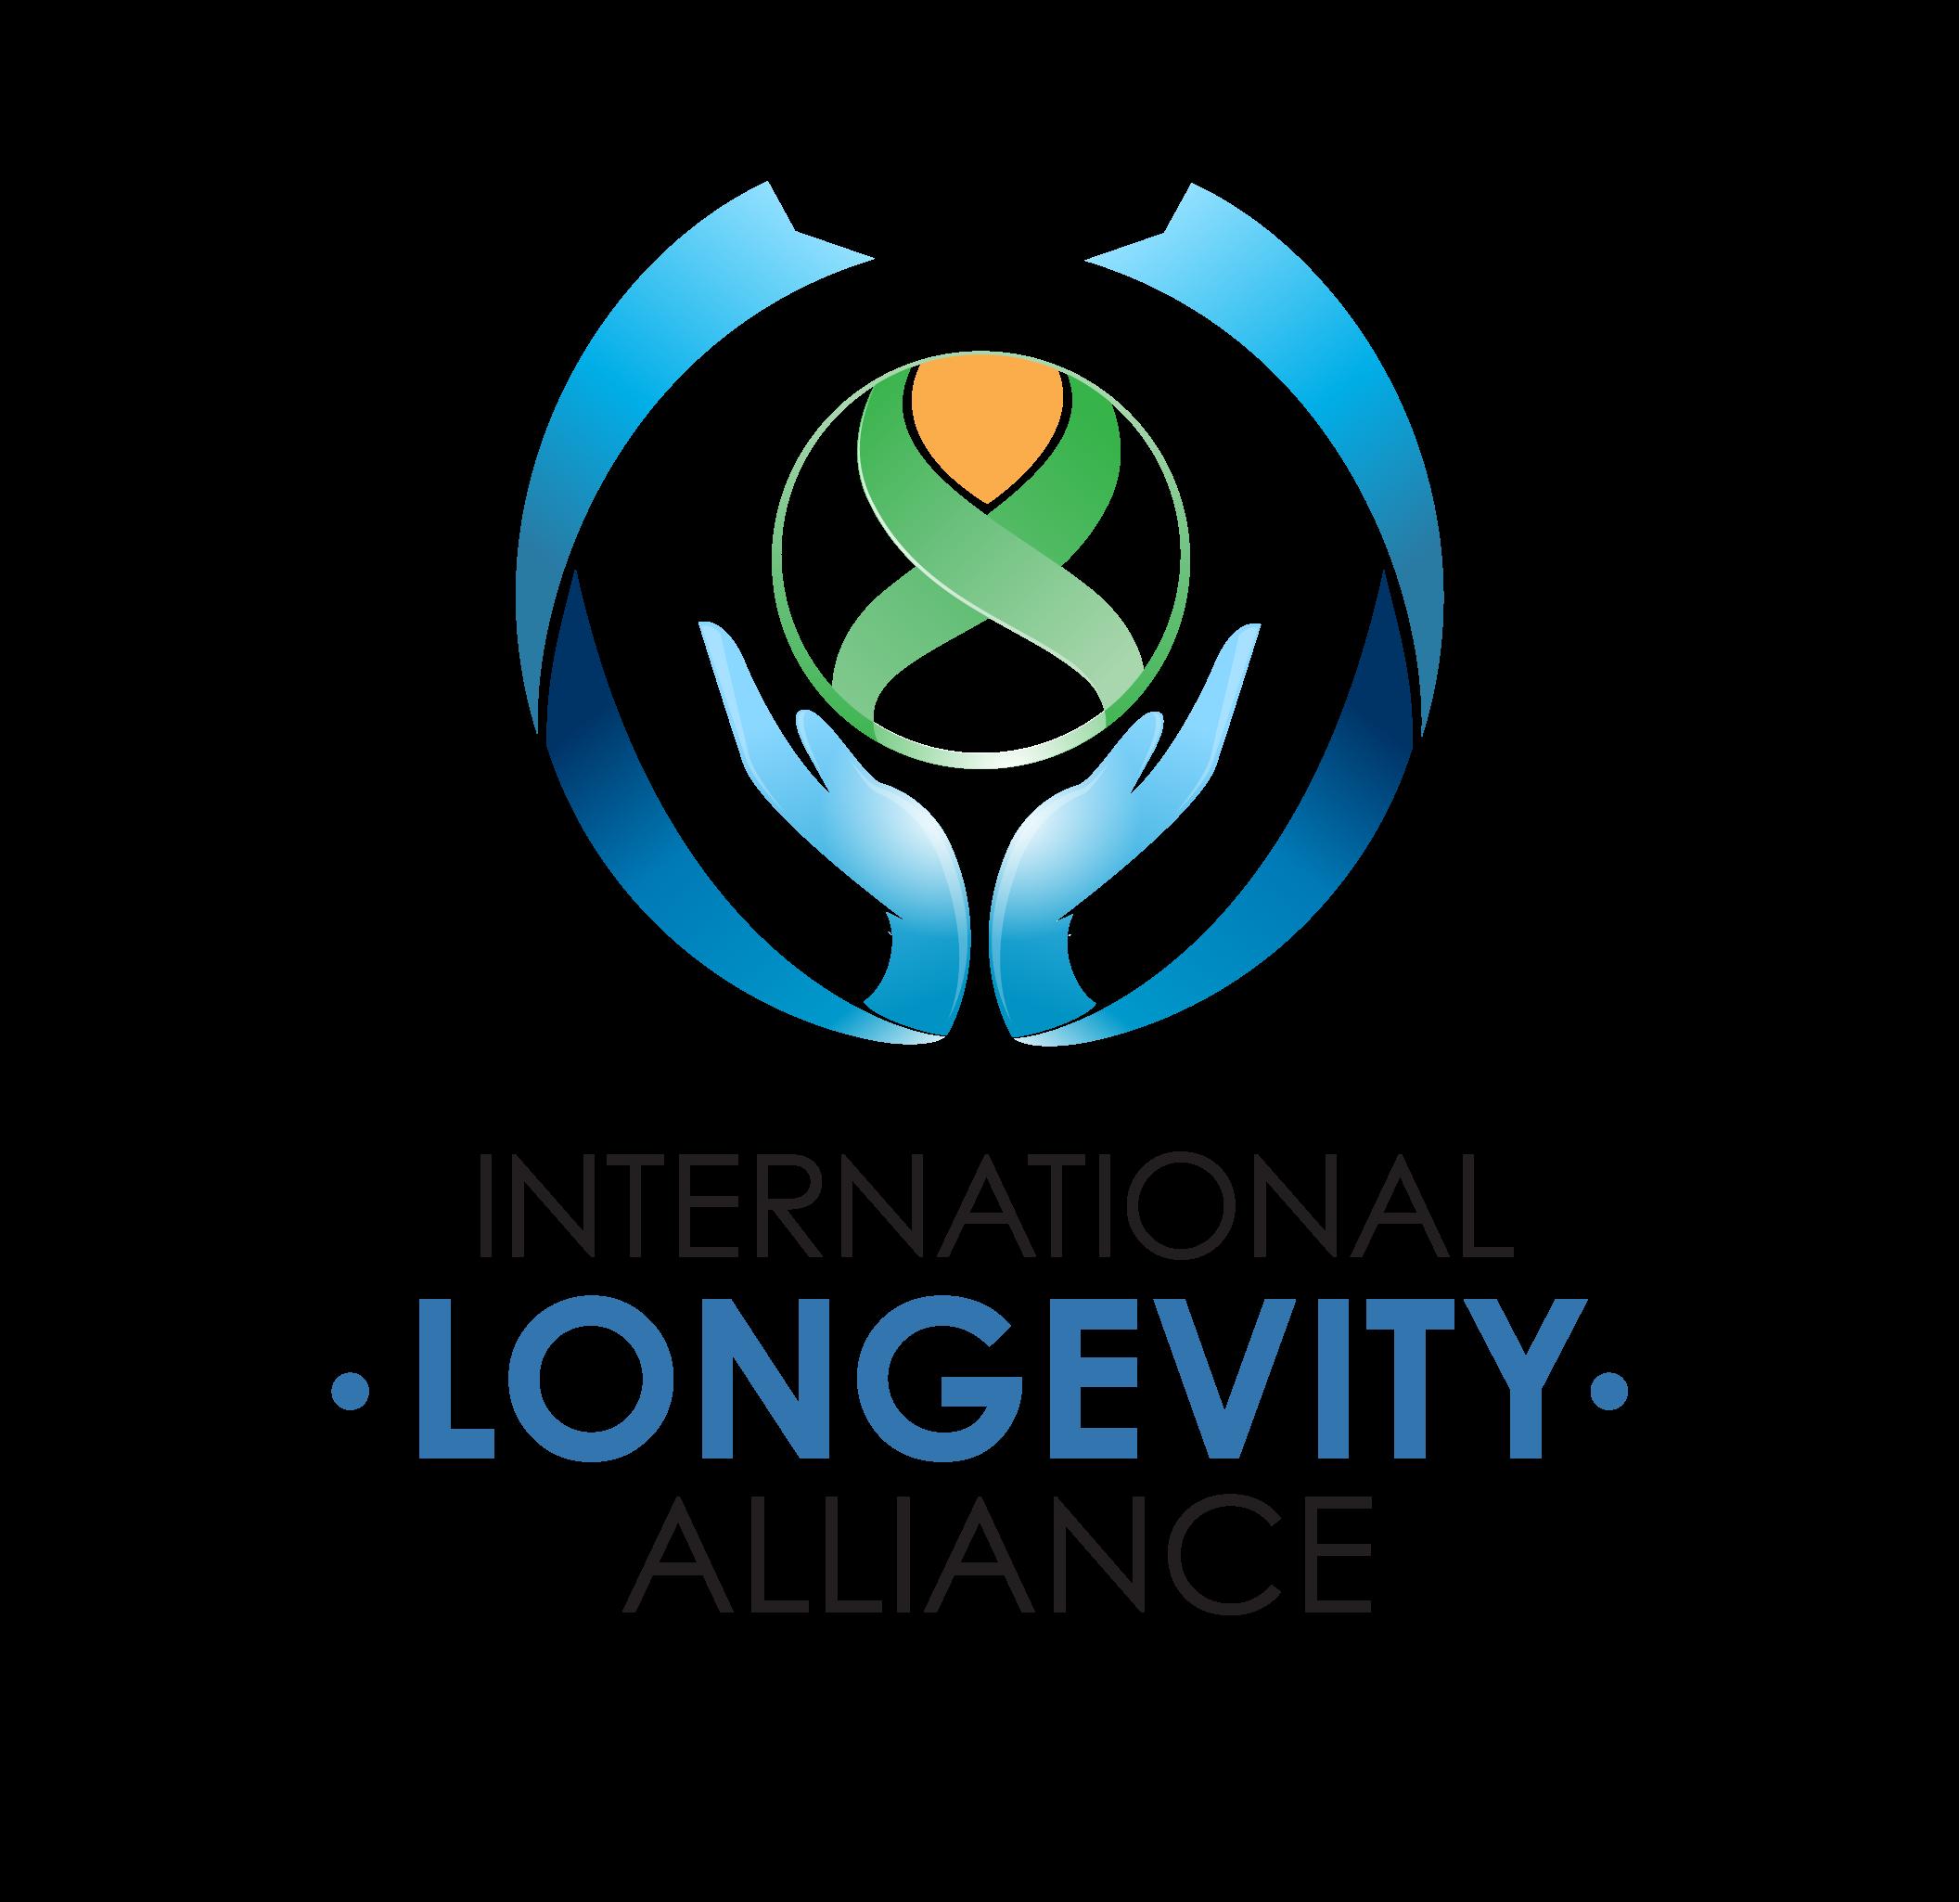 International Longevity Alliance